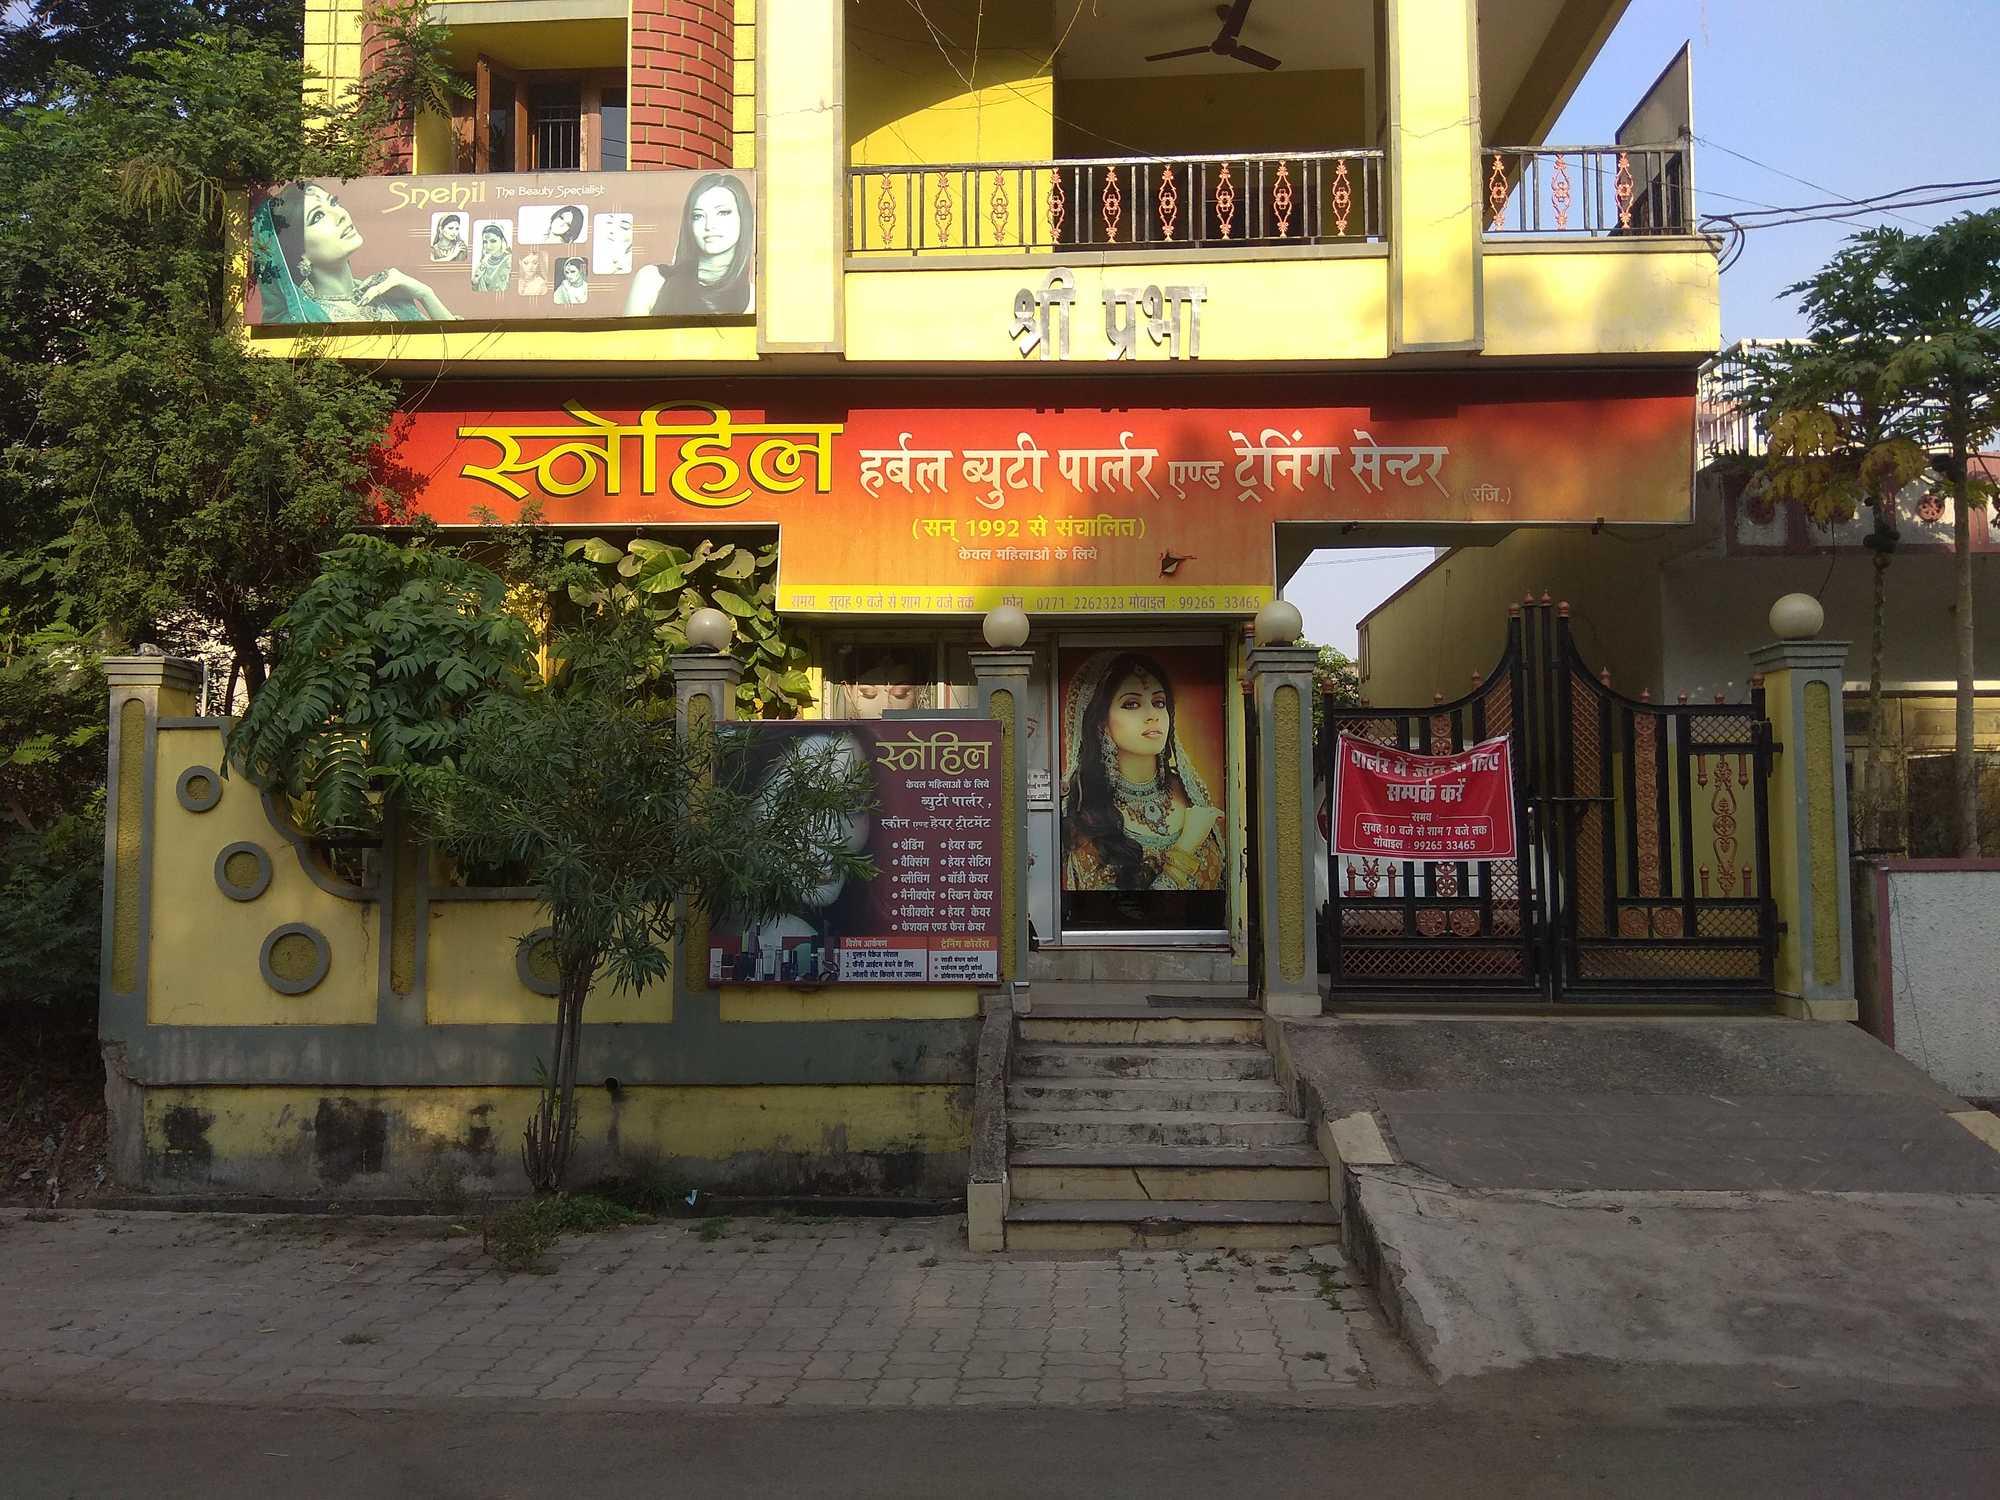 Top 20 Beauty Parlour Institutes in Raipur-Chhattisgarh - Best